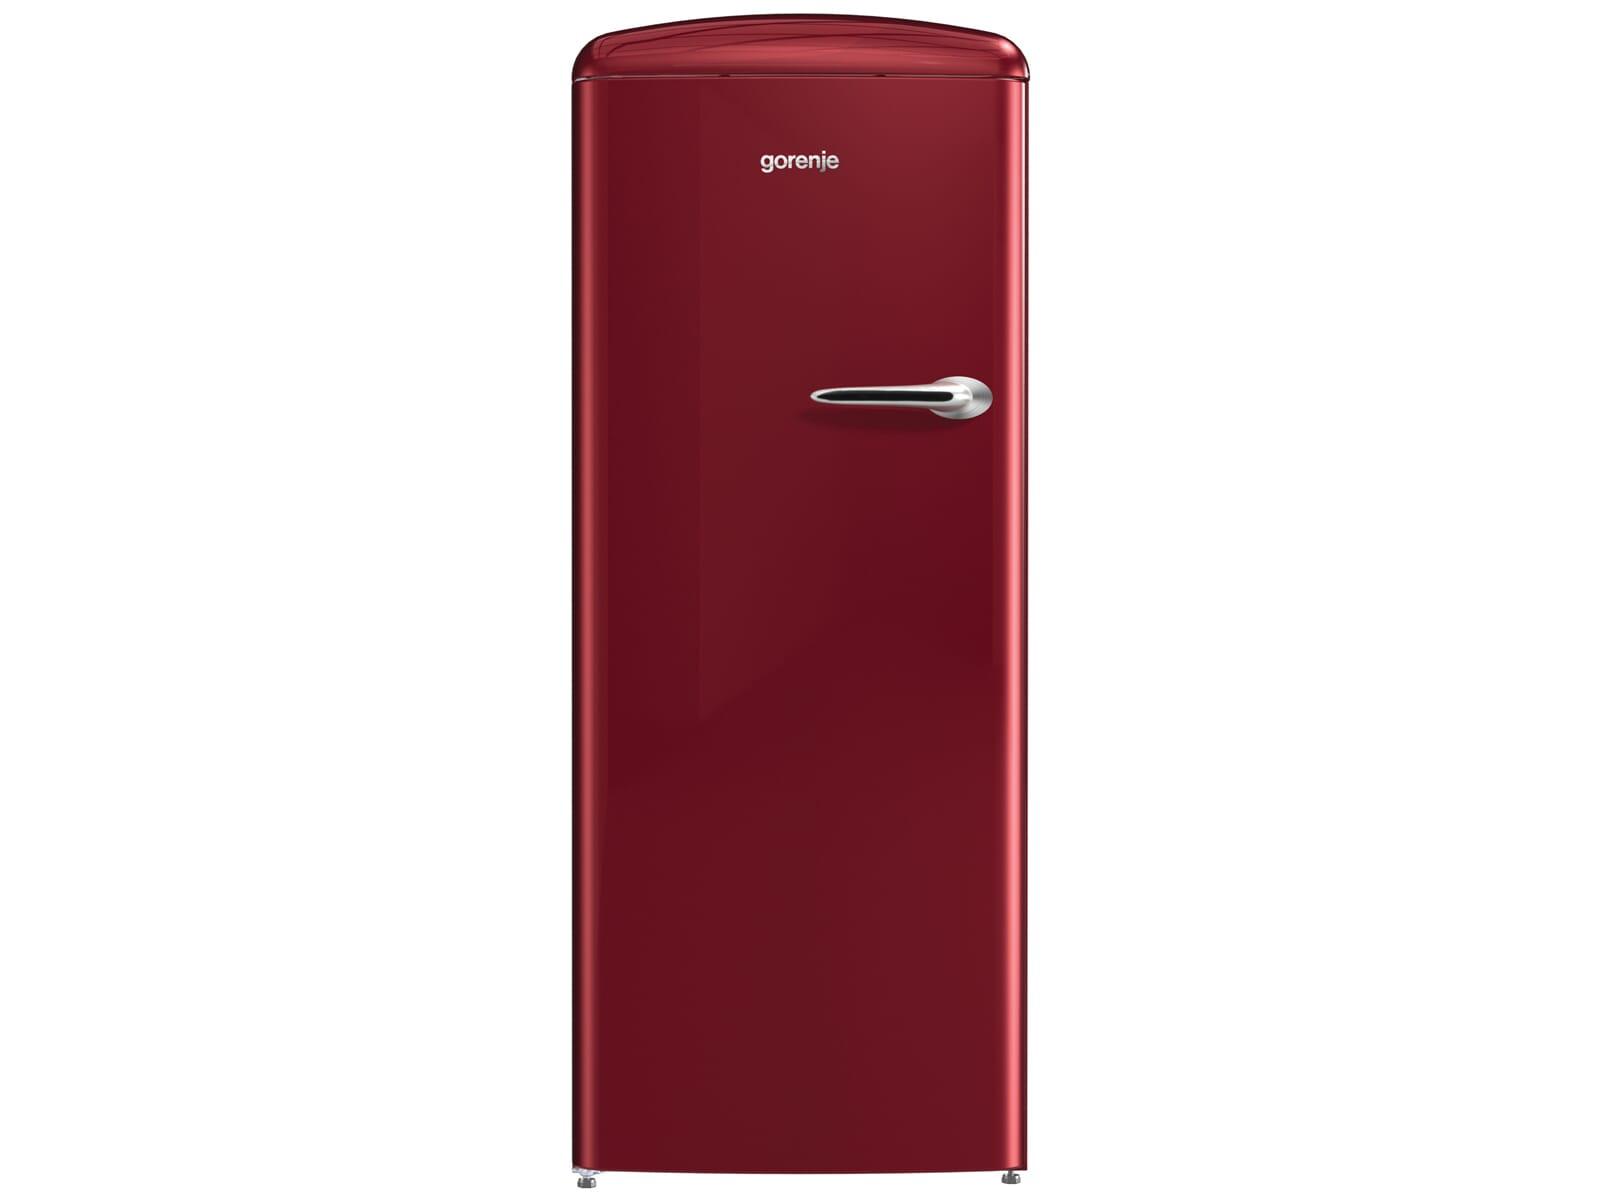 Gorenje Kühlschrank Orb153r : Gorenje orb r l standkühlschrank burgundy